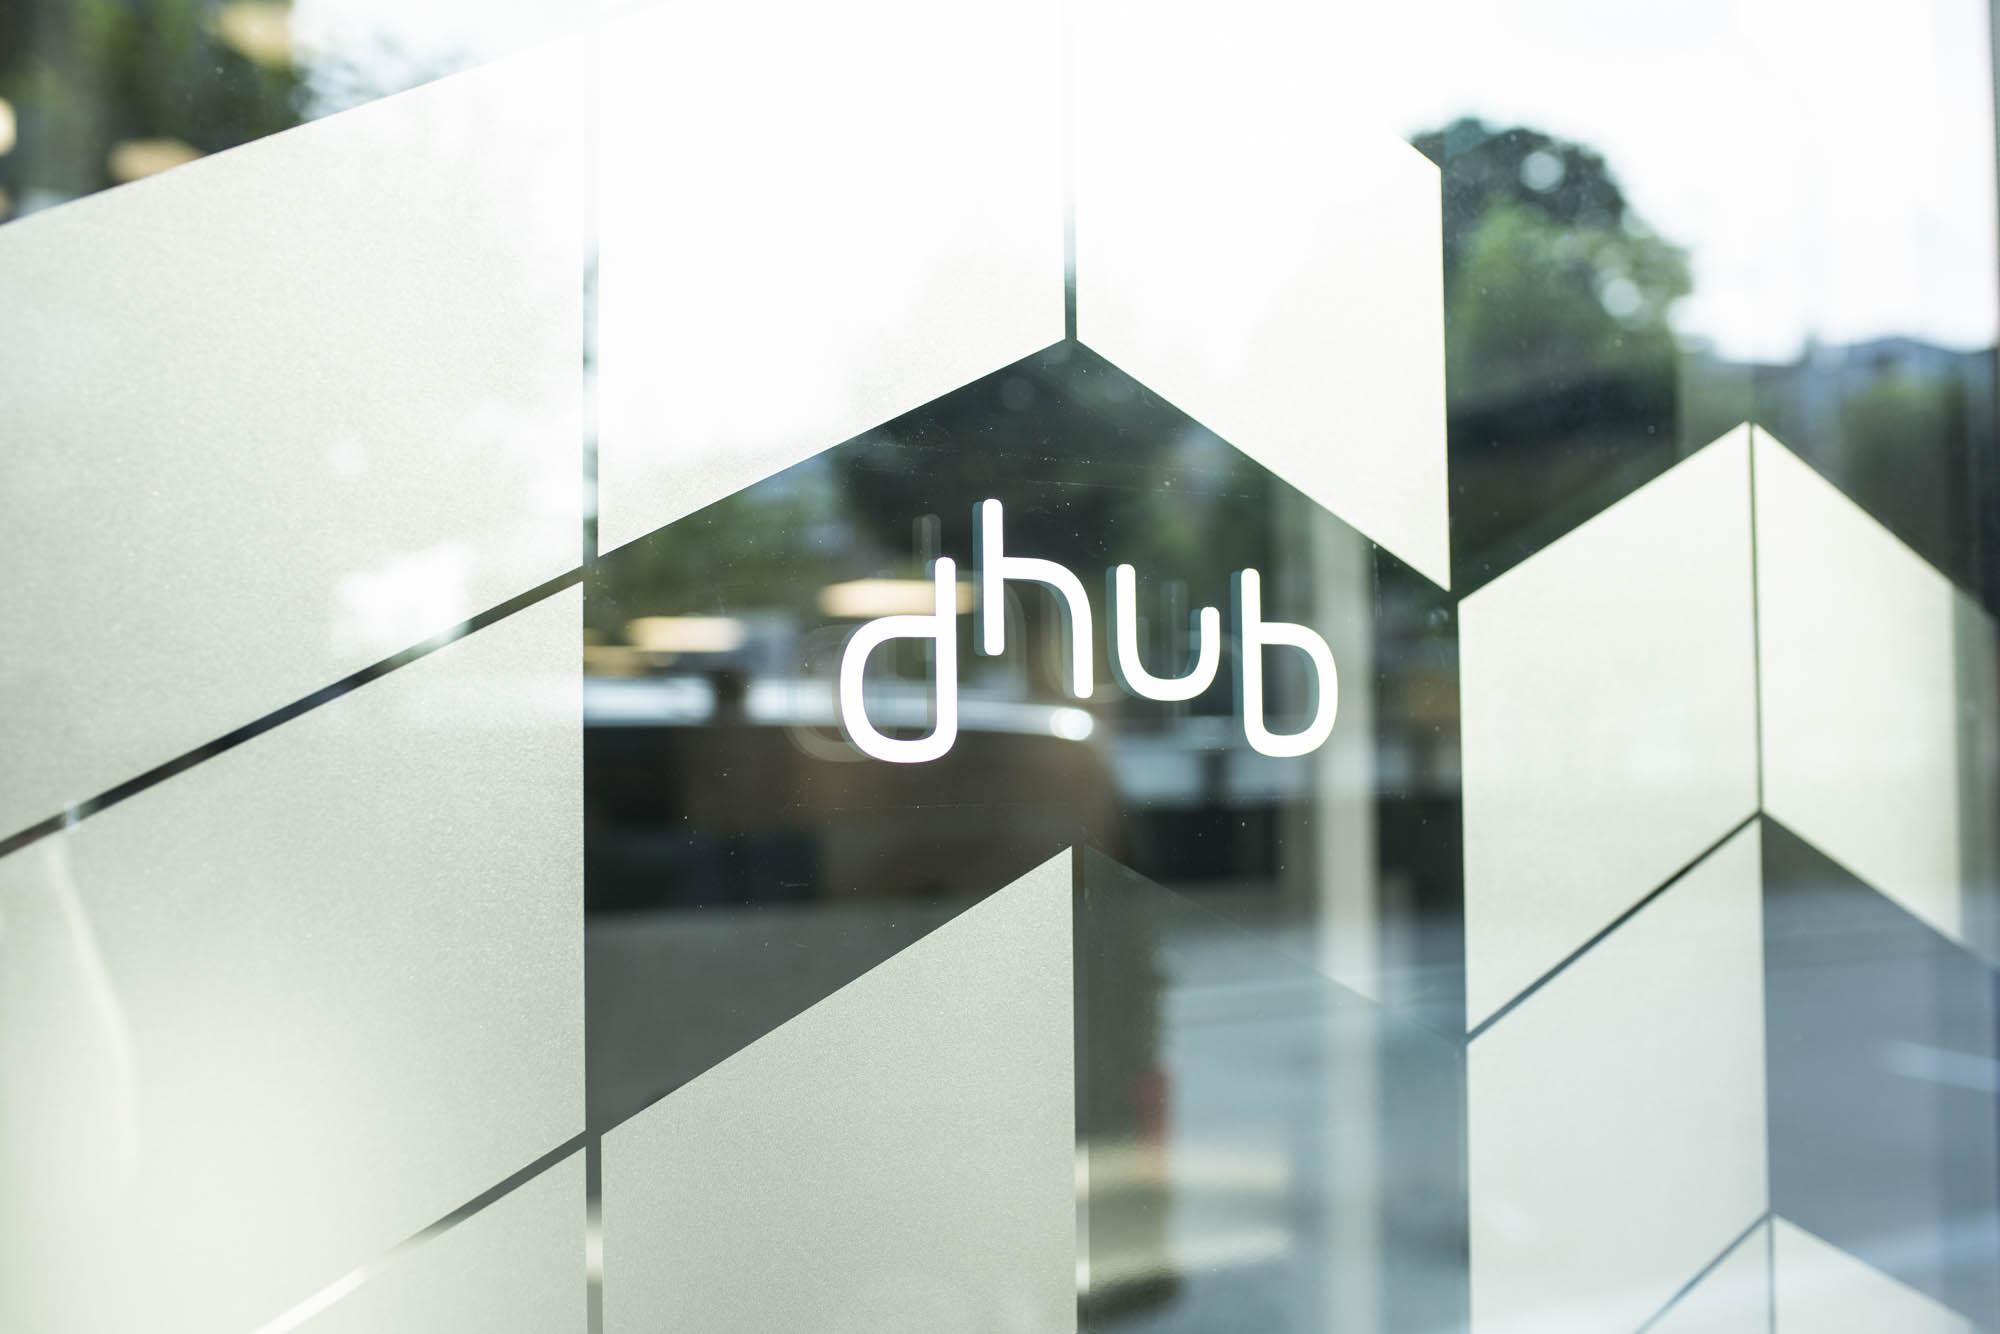 affair har utformet logo, grafisk profil og dekor til dhub i sandefjord